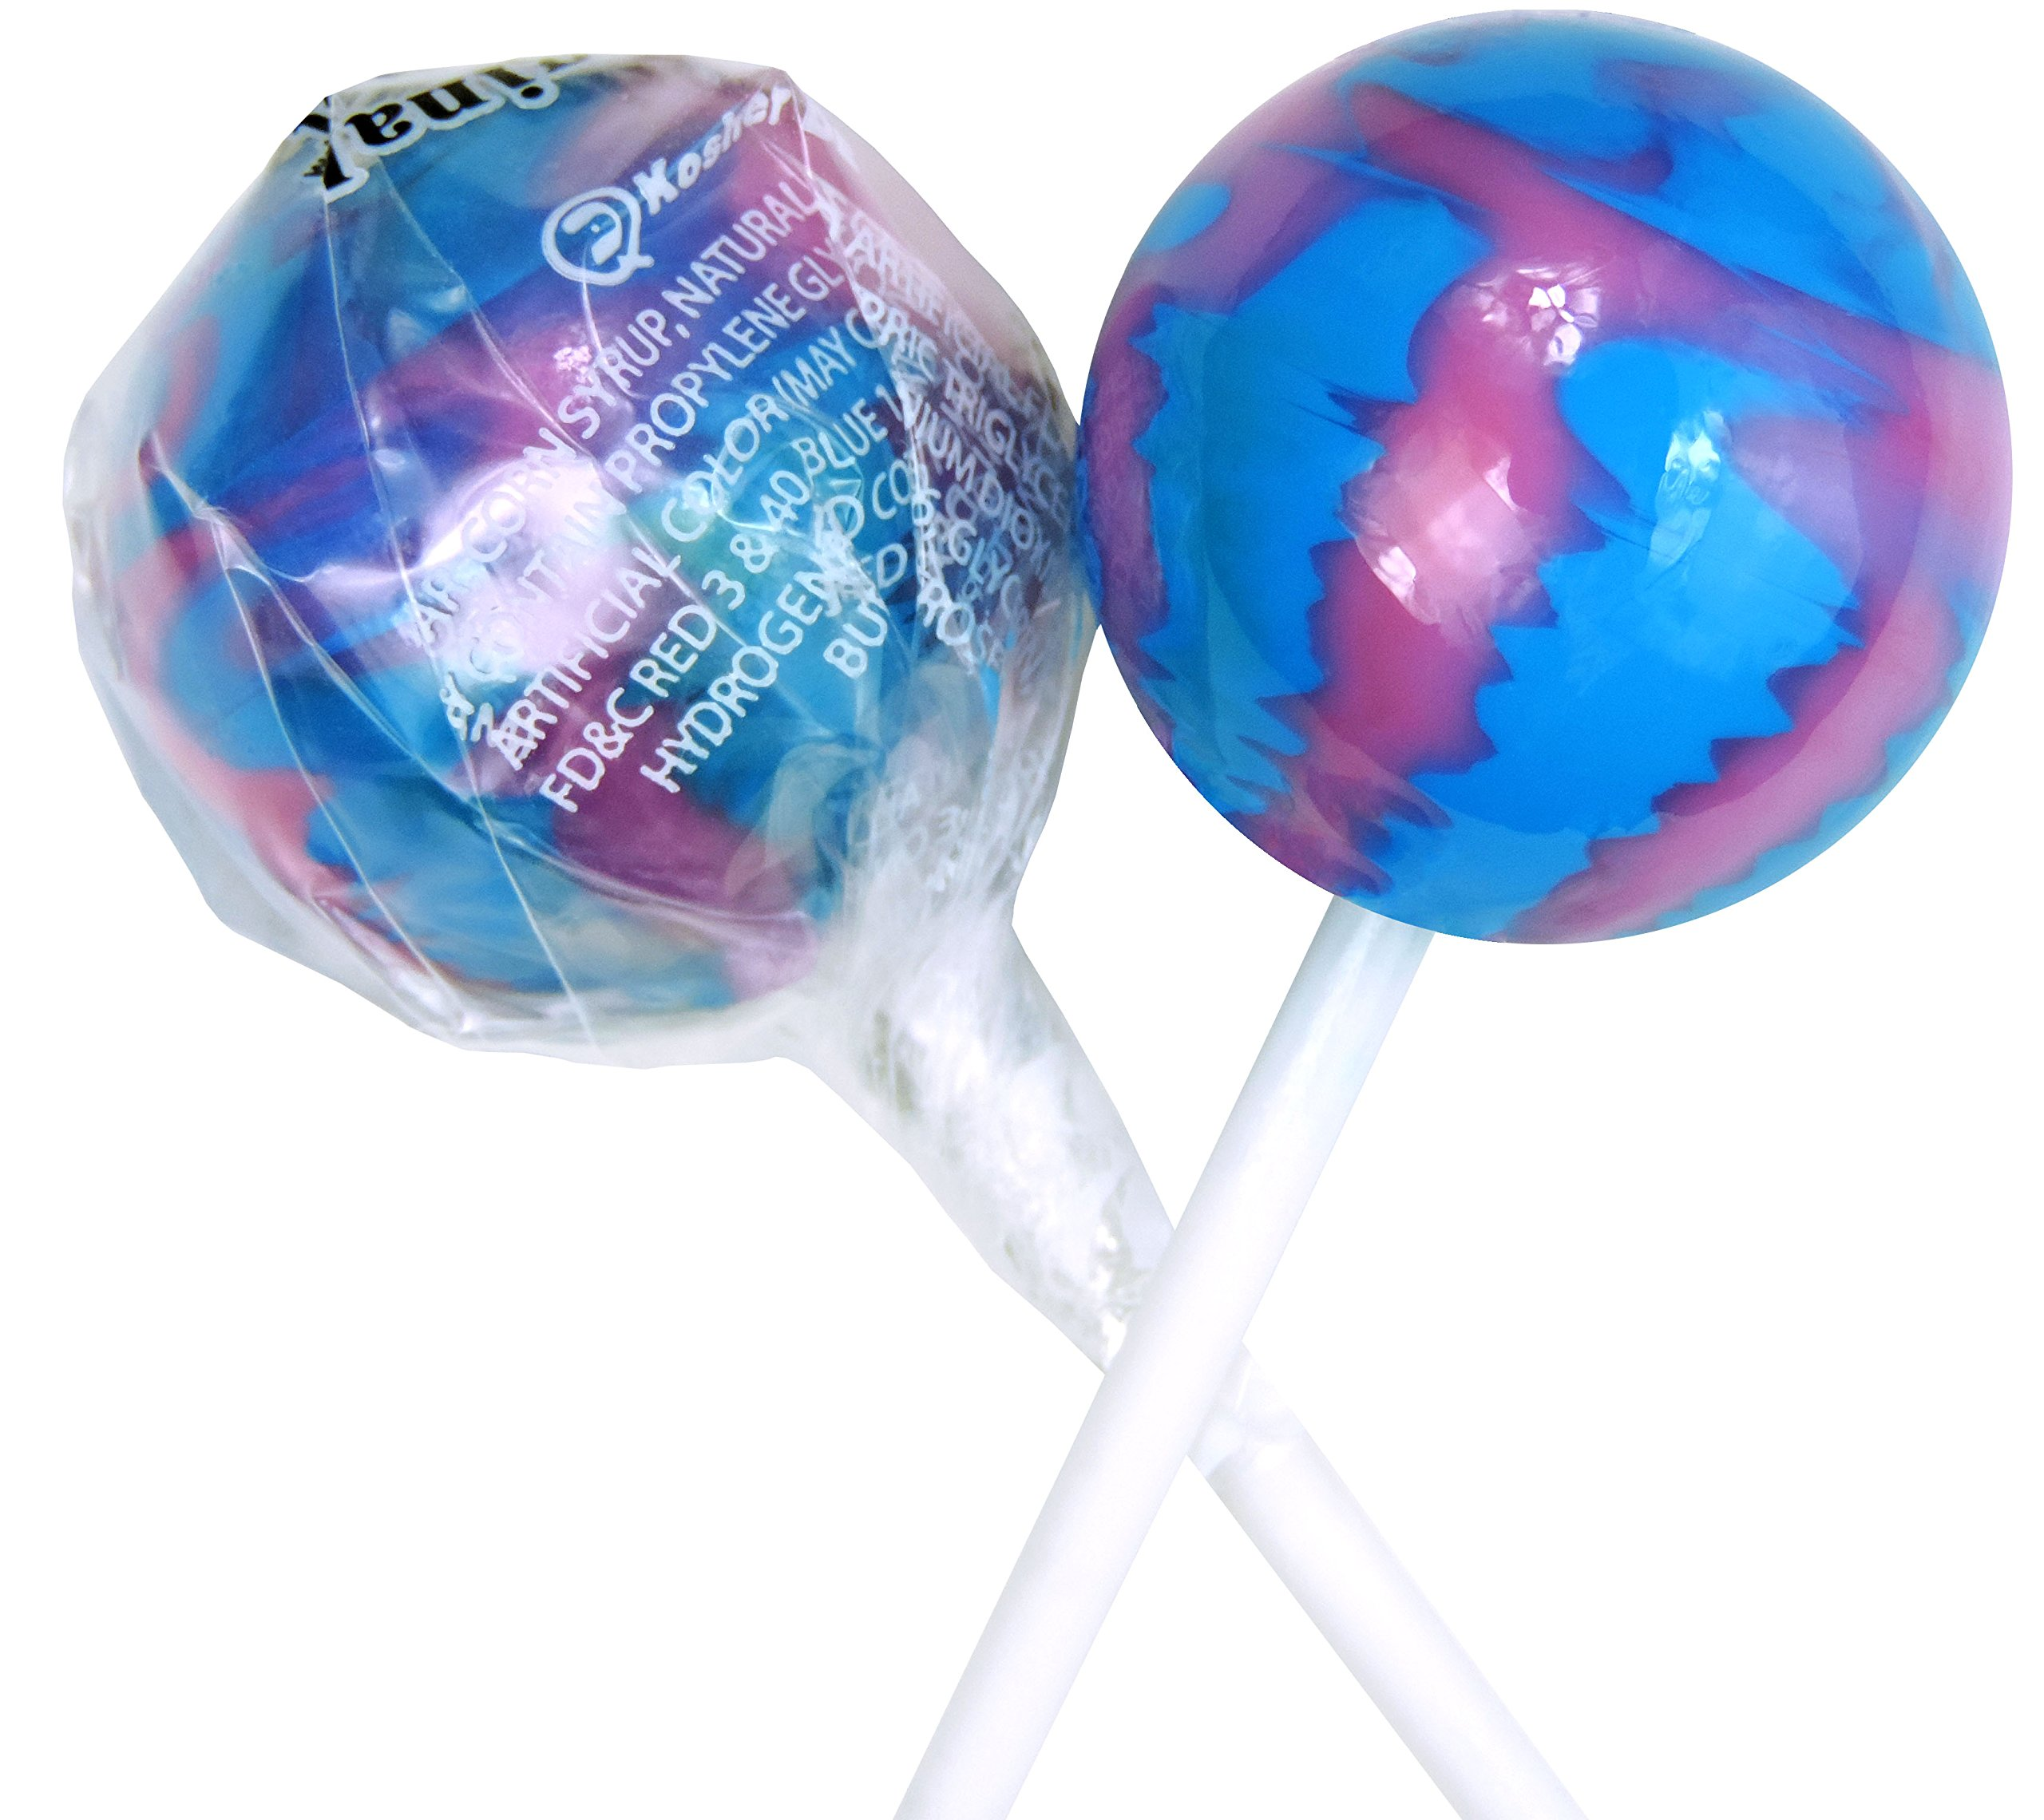 Original Gourmet Lollipops, Cotton Candy, 30 Count by Original Gourmet